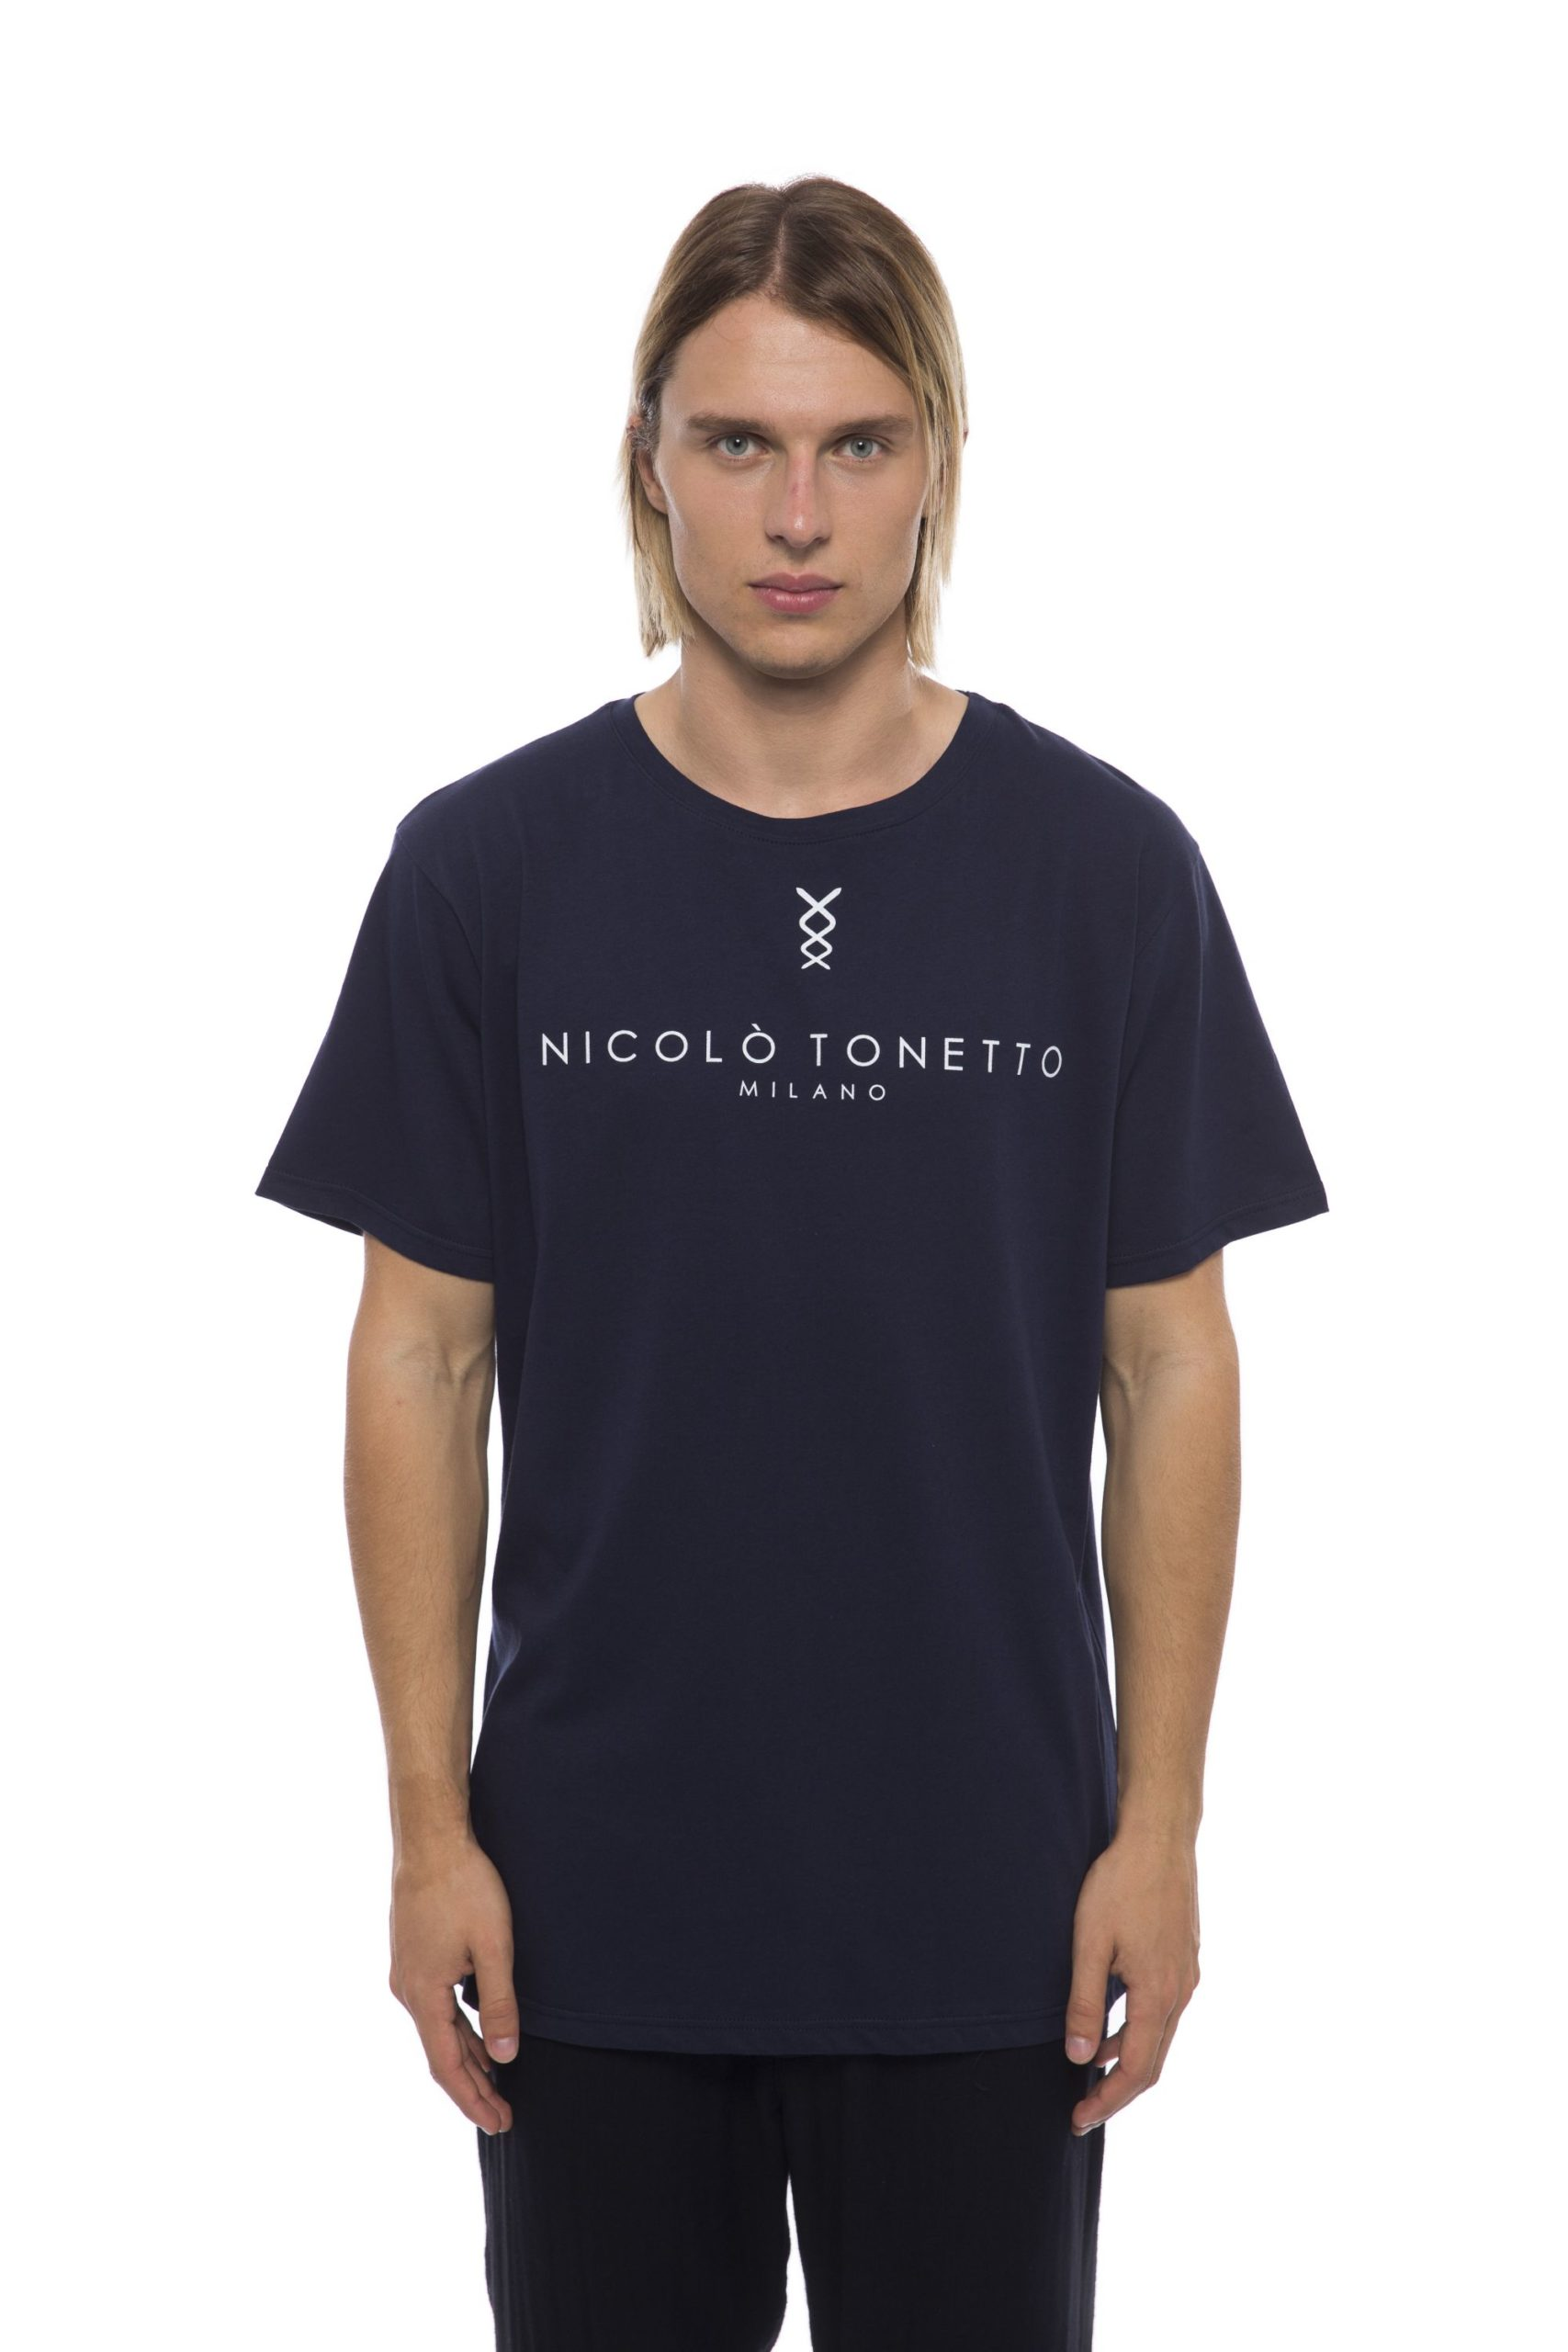 Nicolo Tonetto Men's T-Shirt Blue NI681957 - XXL